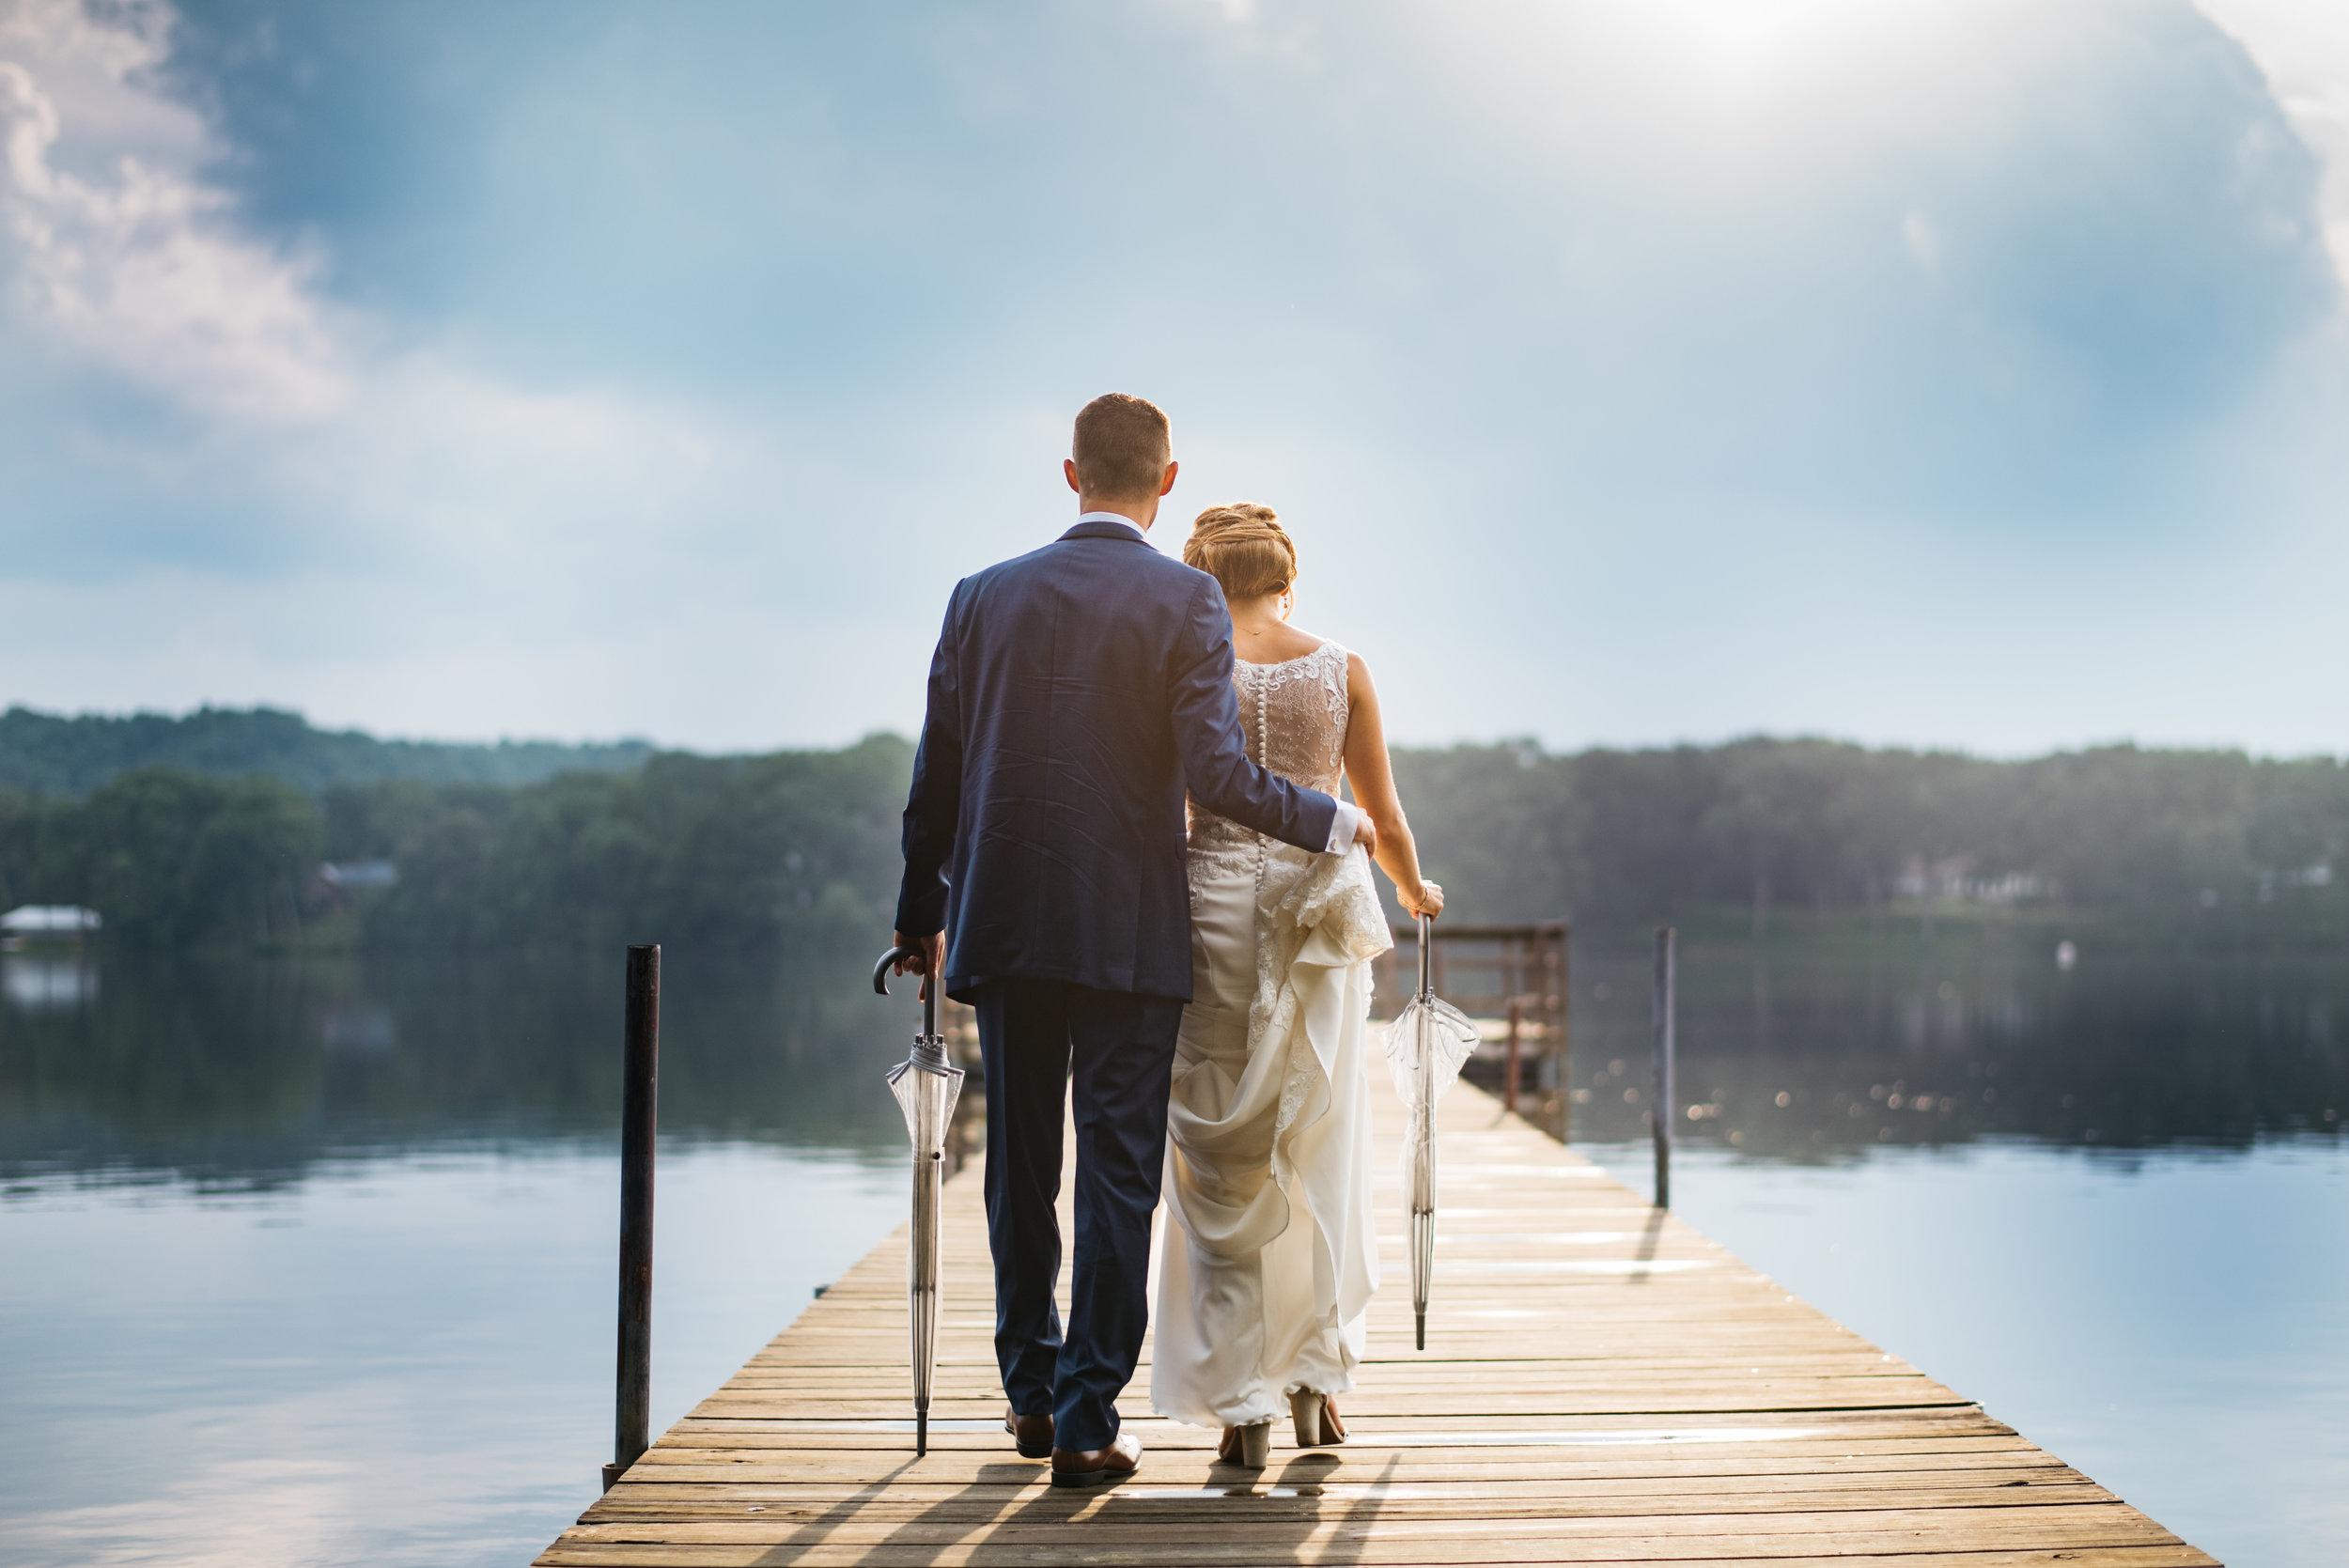 WeddingPhotos | NJPhotographer | Highlights-10-9.jpg